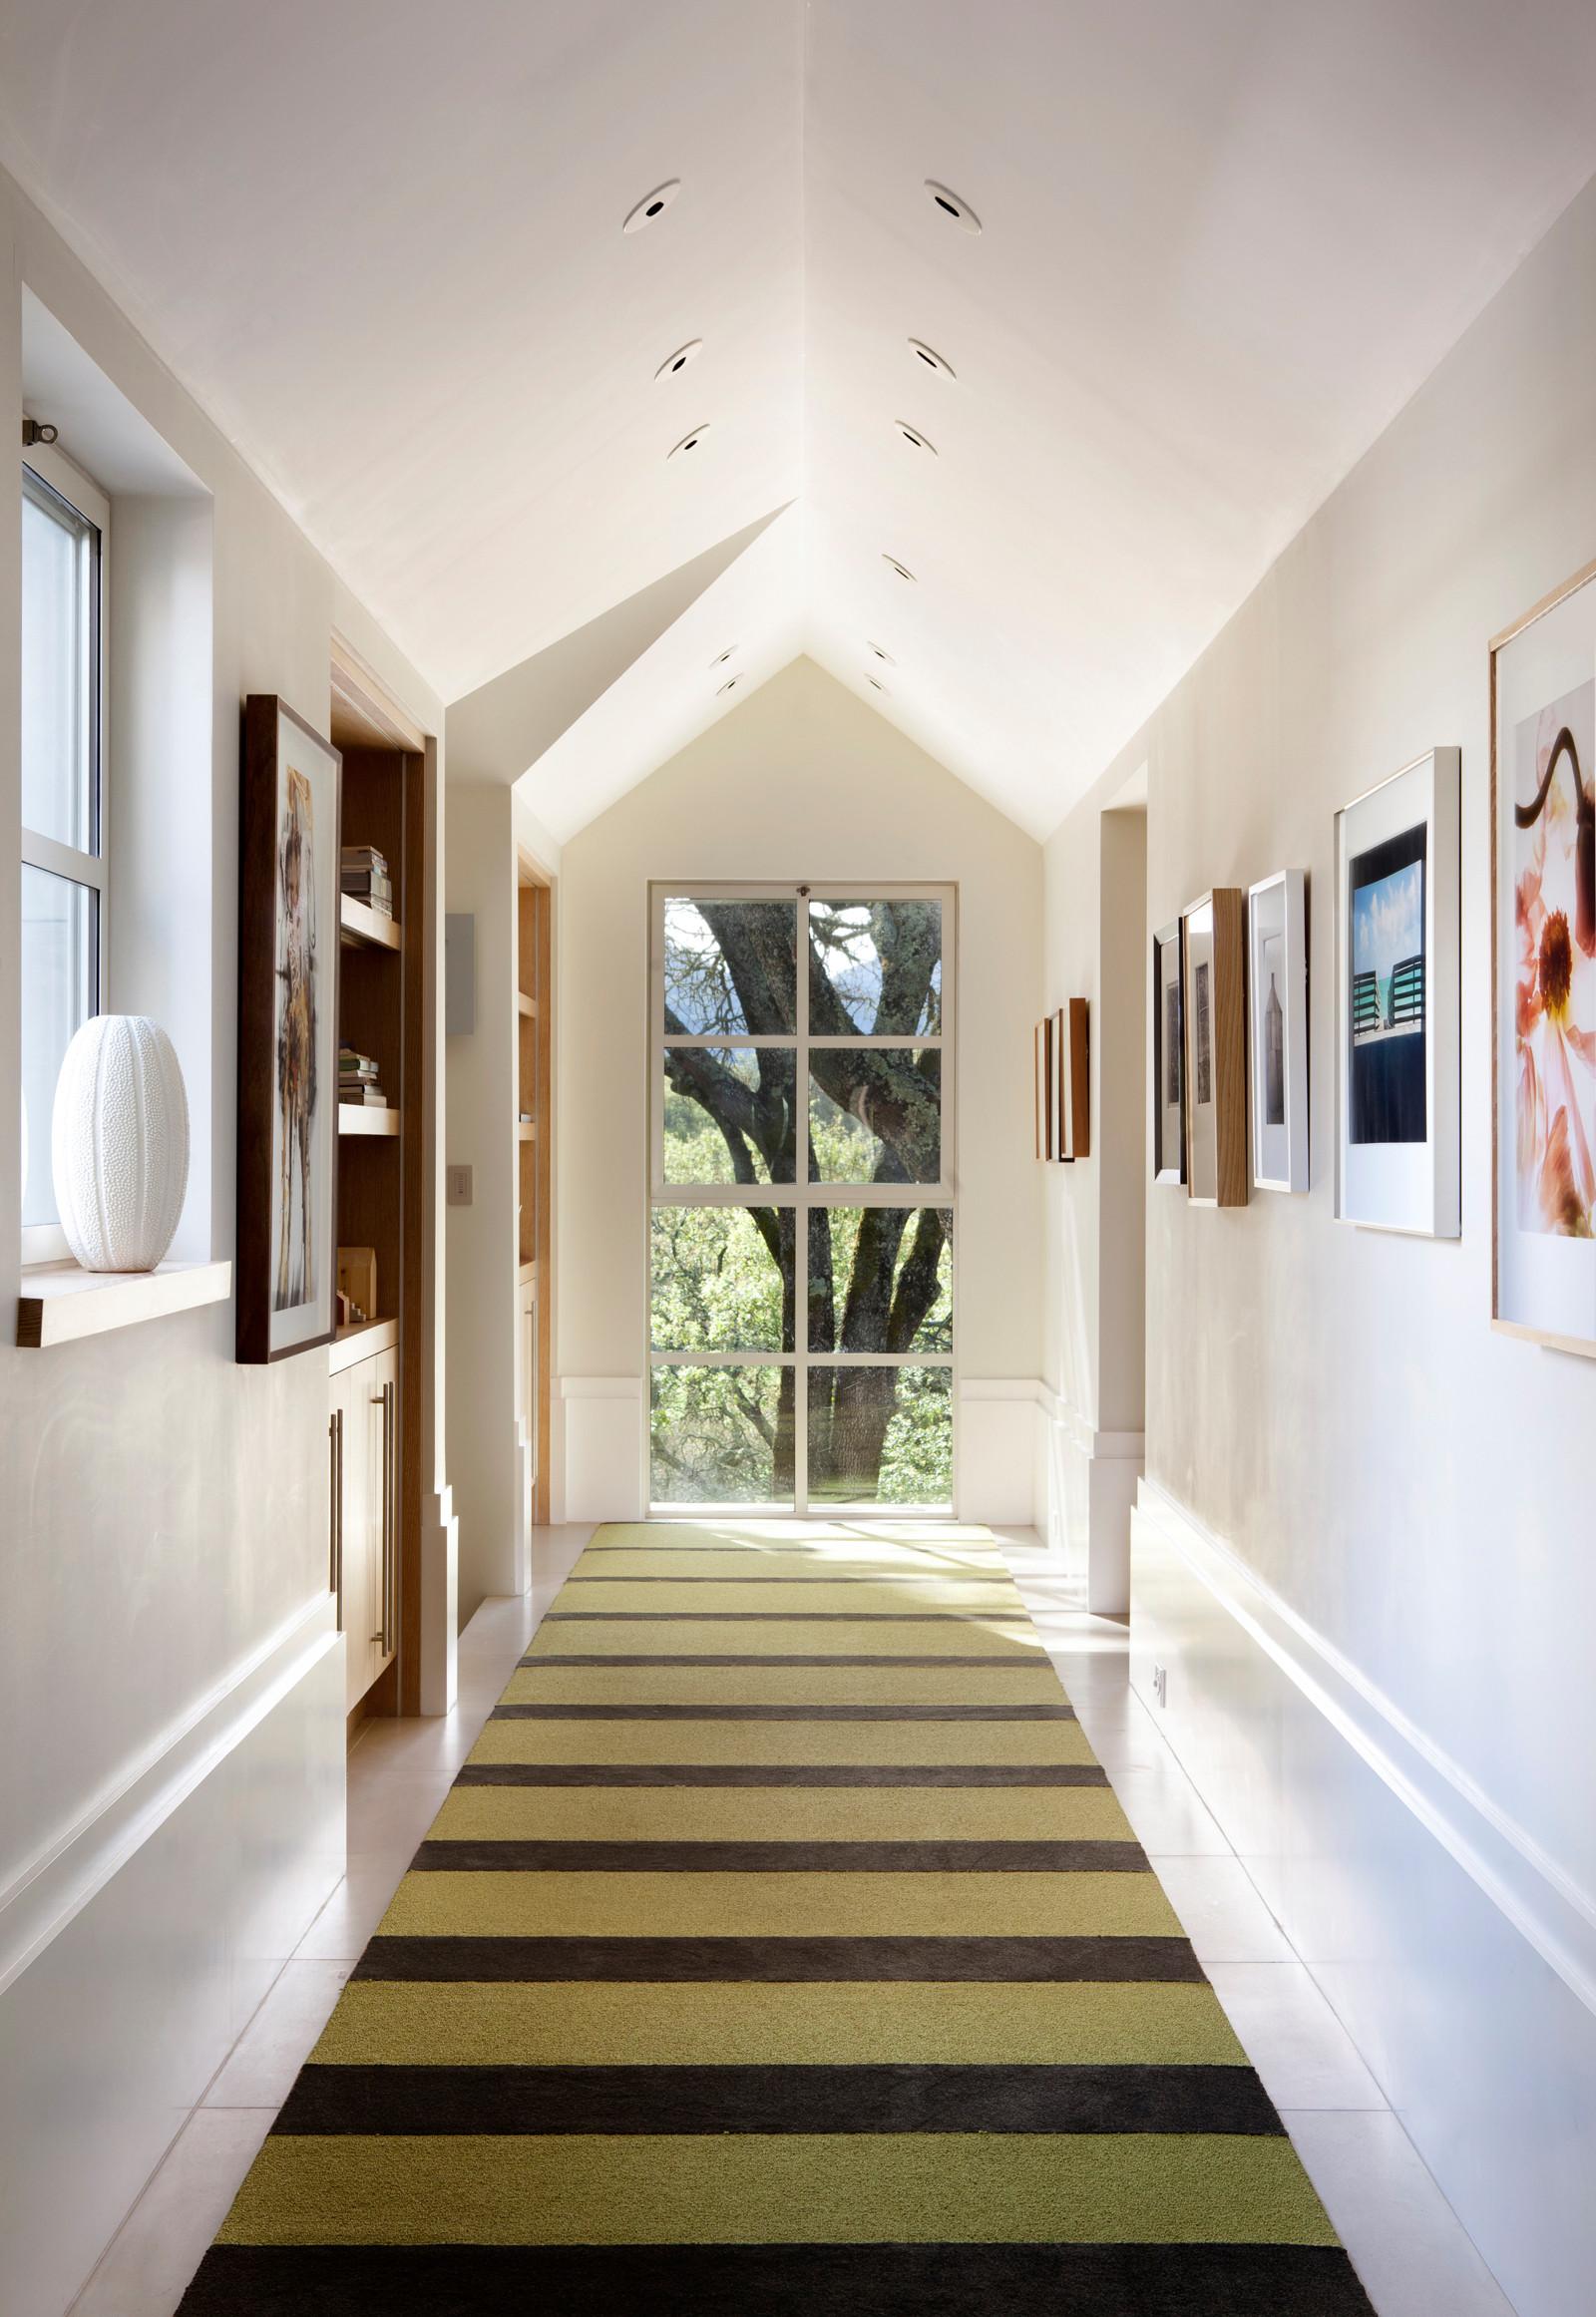 75 Beautiful Farmhouse Hallway Pictures Ideas April 2021 Houzz